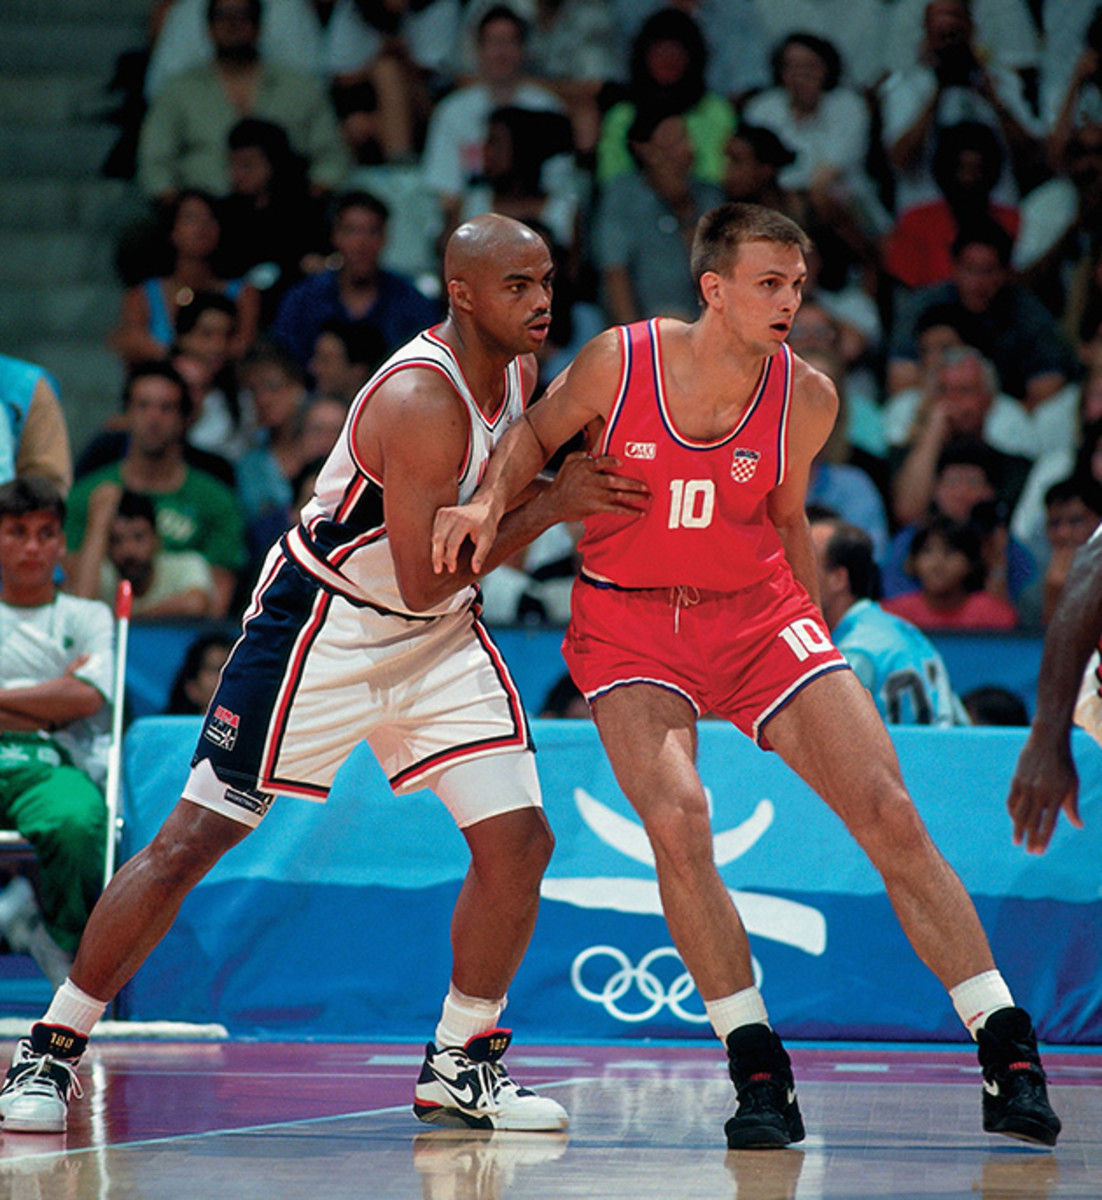 si-vault-charles-barkley-1992-olympics-dream-team-630-2.jpg